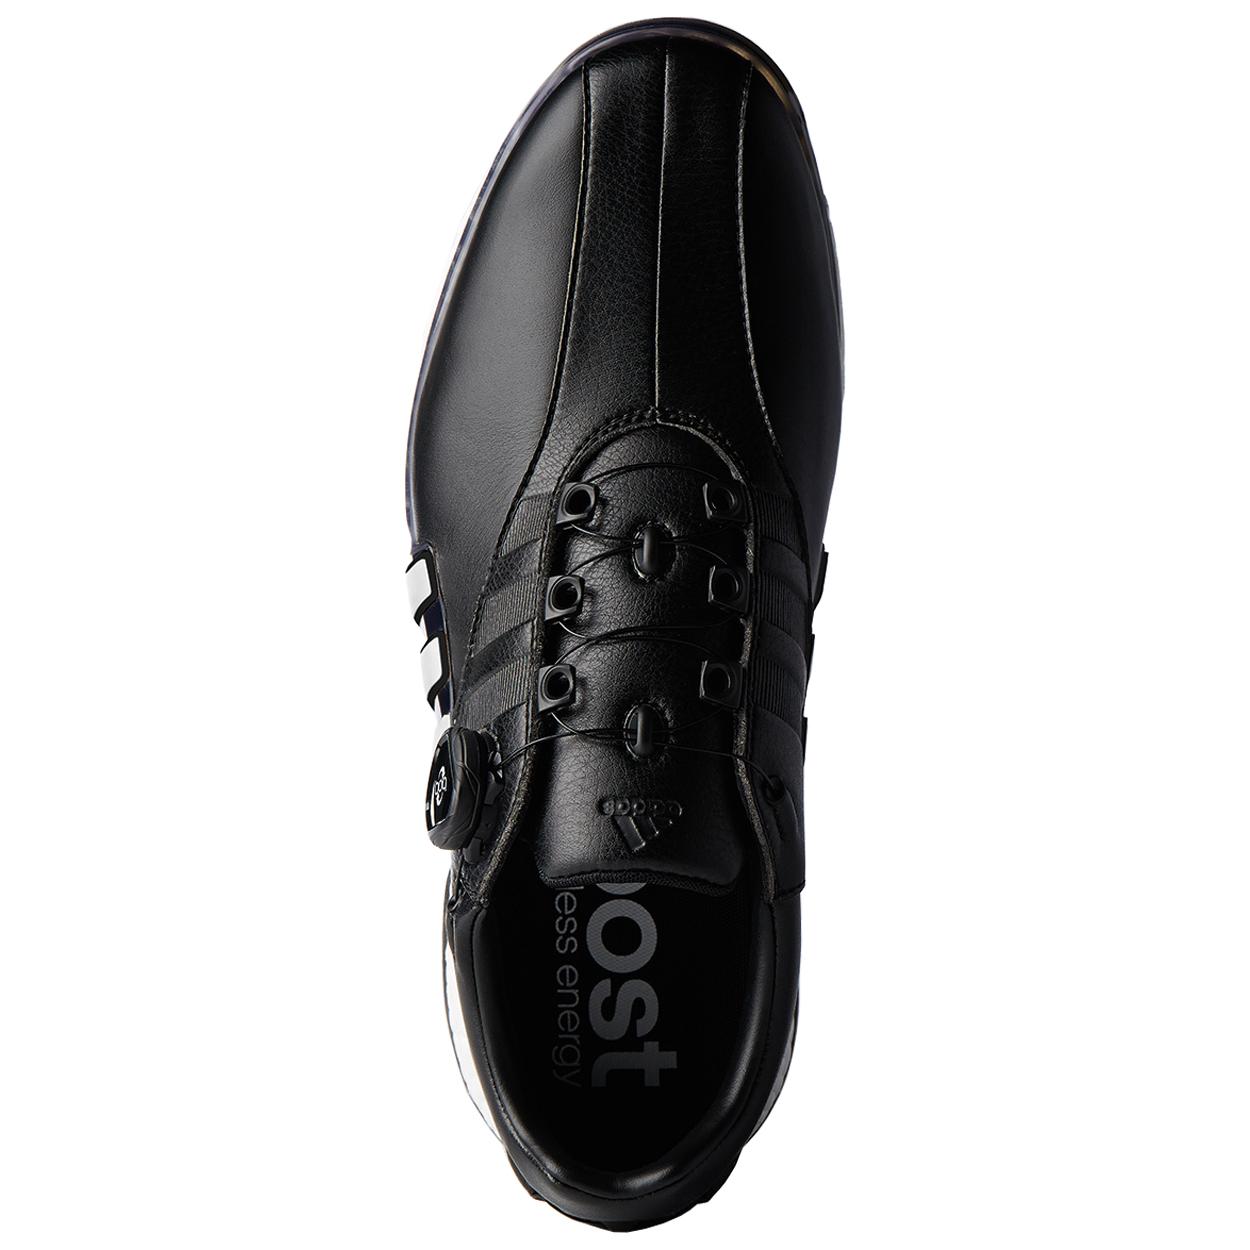 Adidas-Men-039-s-Tour-360-EQT-Boa-Golf-Shoes-Brand-New thumbnail 7